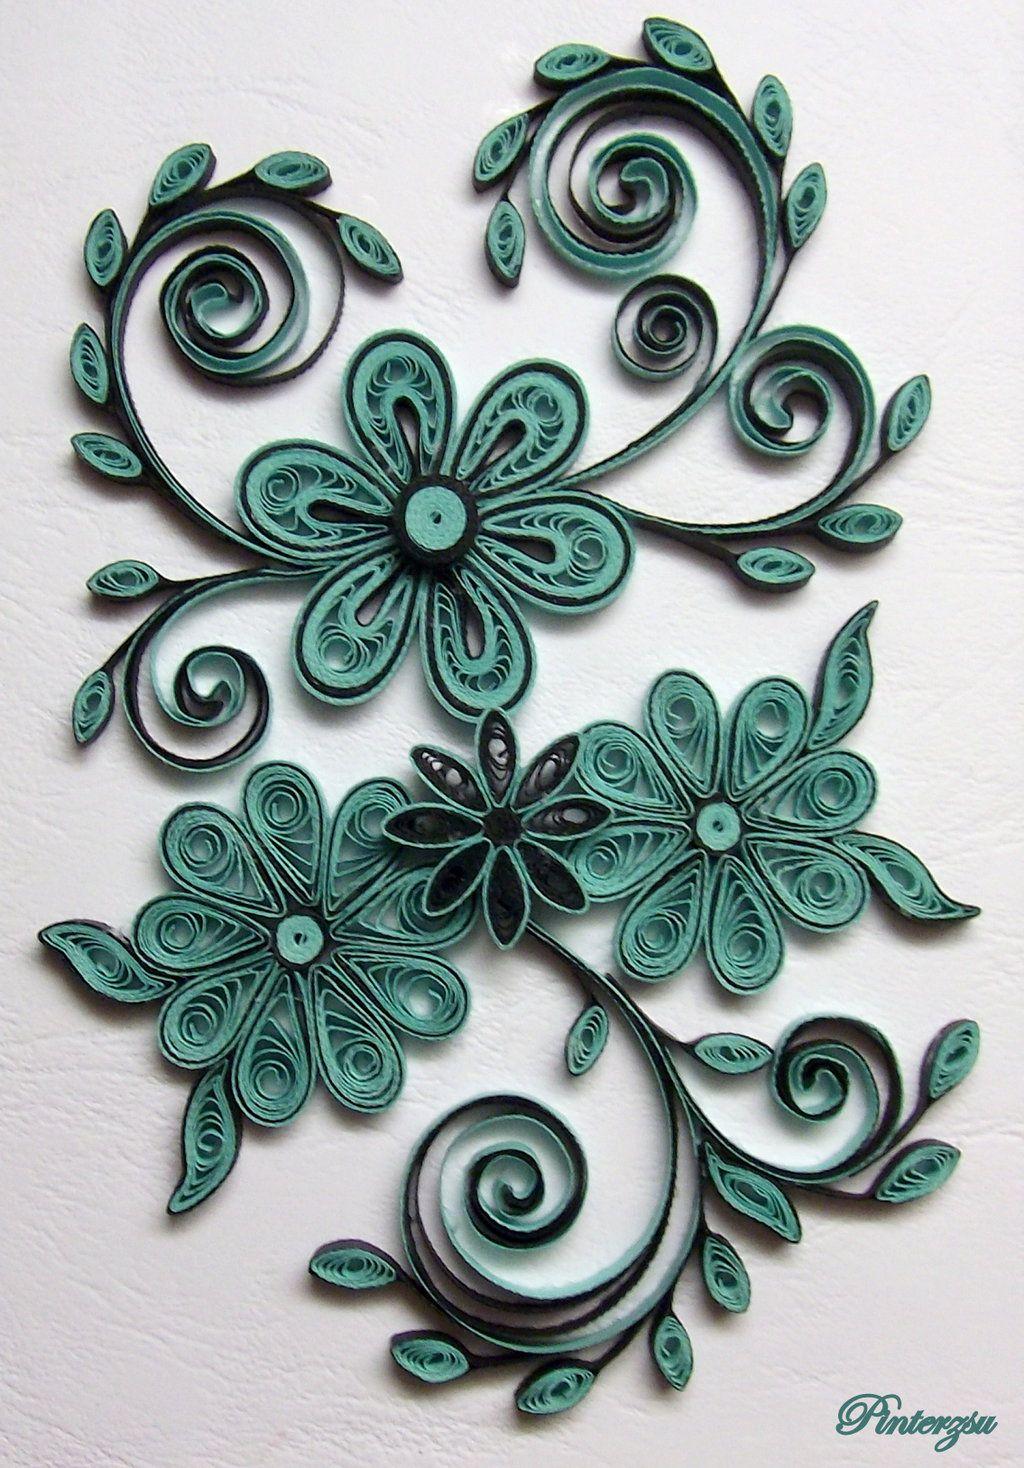 Quilled Flowers By Pinterzsuiantart On Deviantart